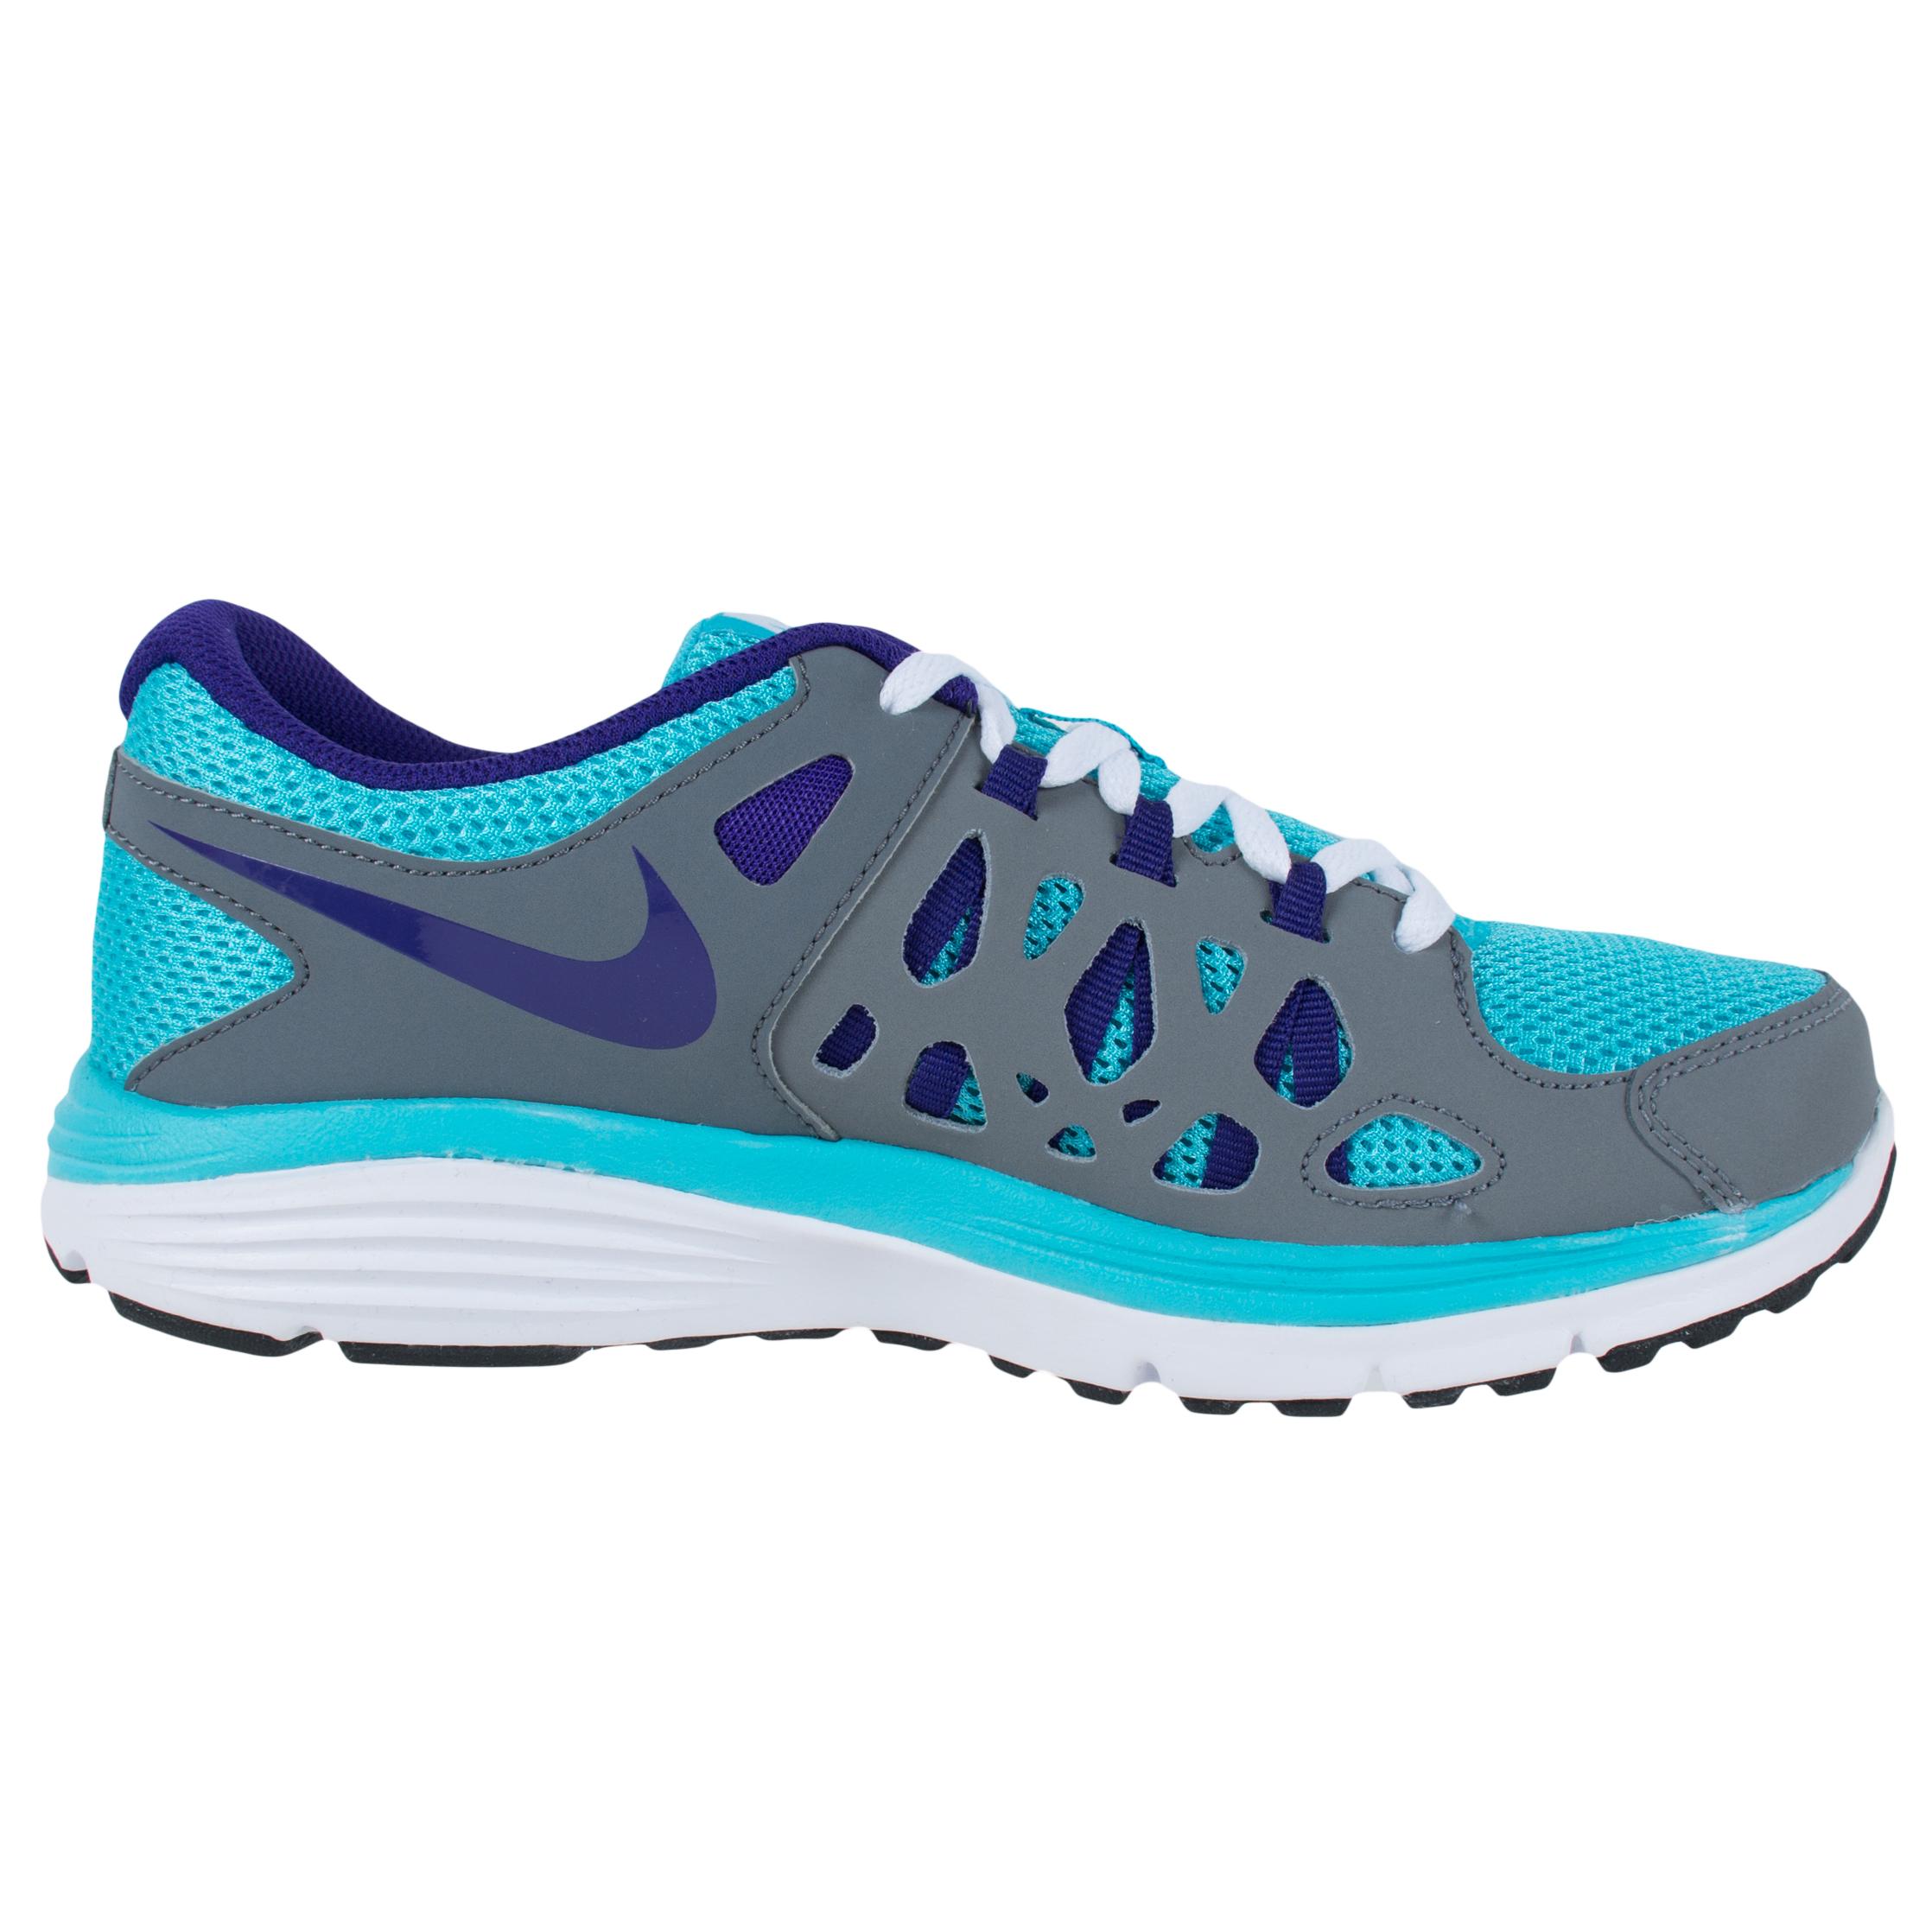 nike run 2 turquoise girl ebay